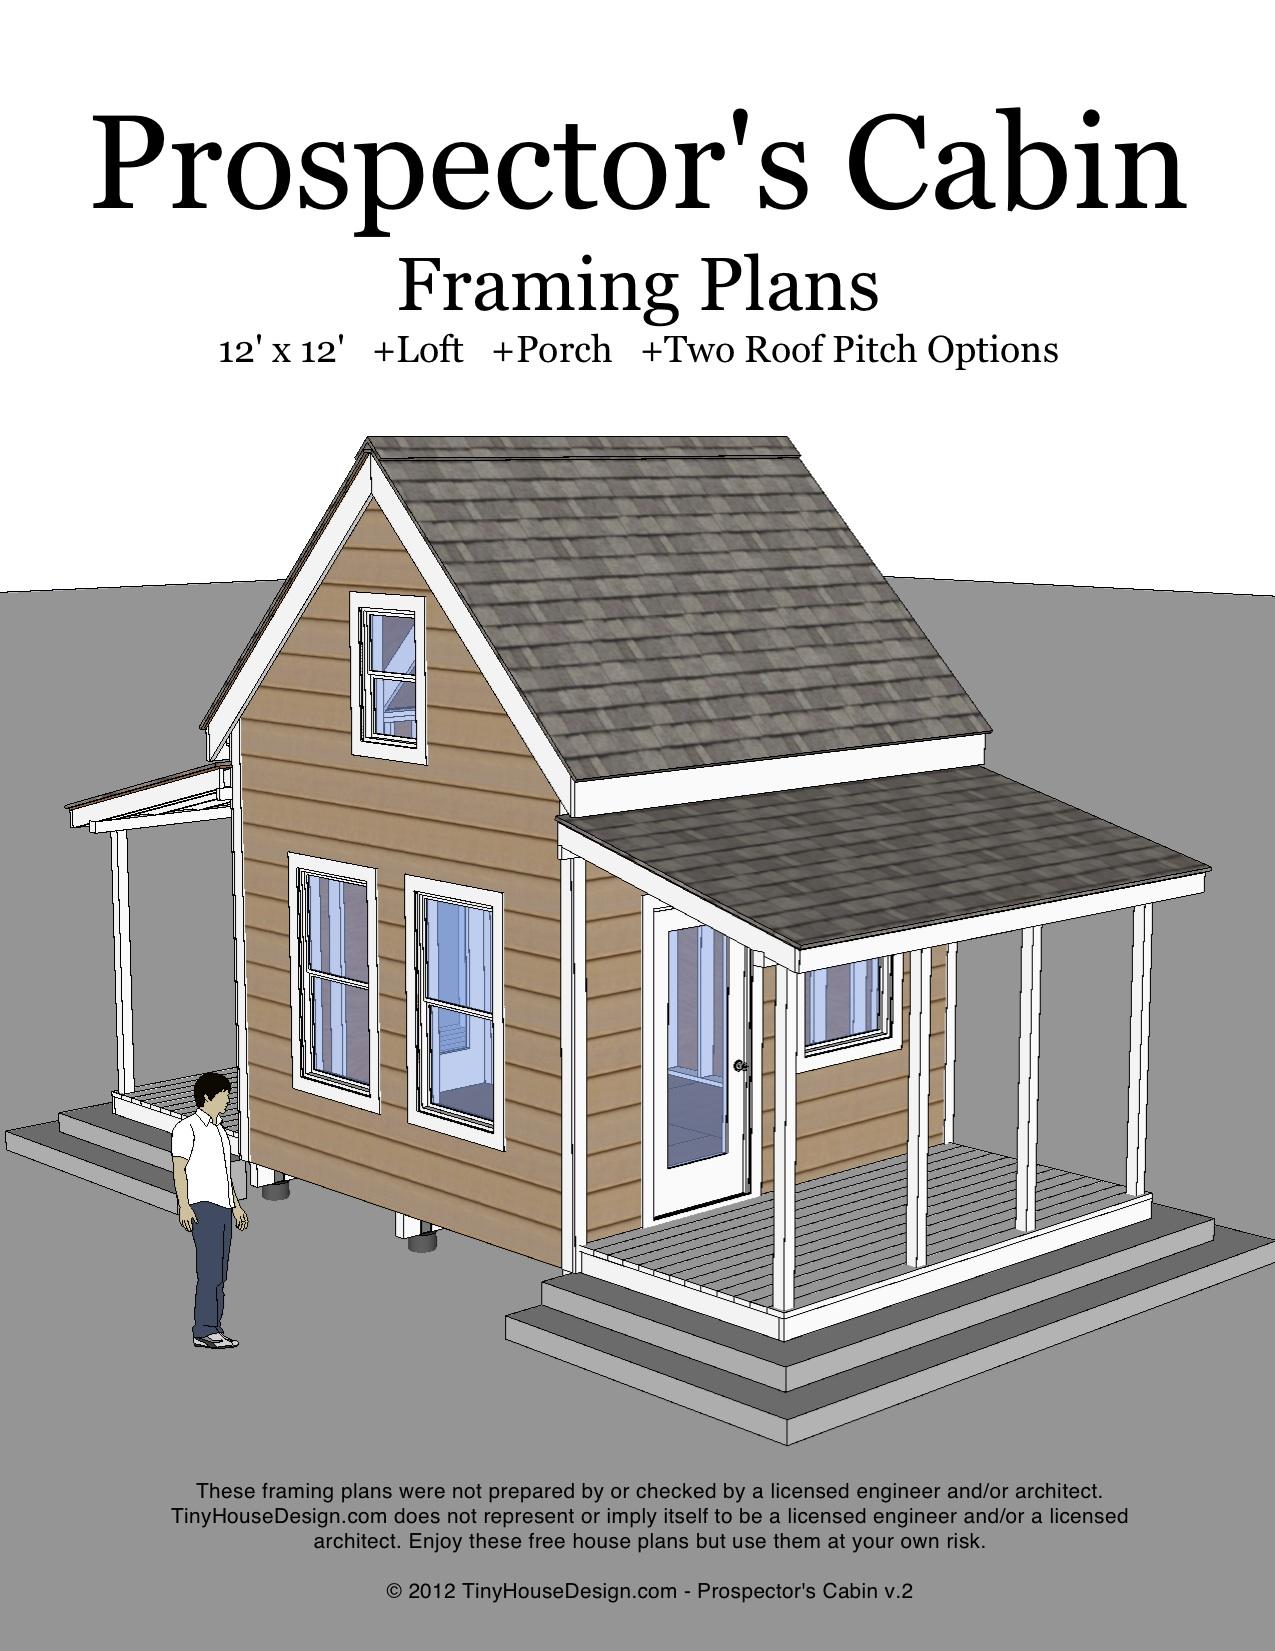 Prospectors Cabin 12x12 v2 cover?resize=450%2C582 prospector's cabin (12'x12\u2032),12x12 Tiny House Plans